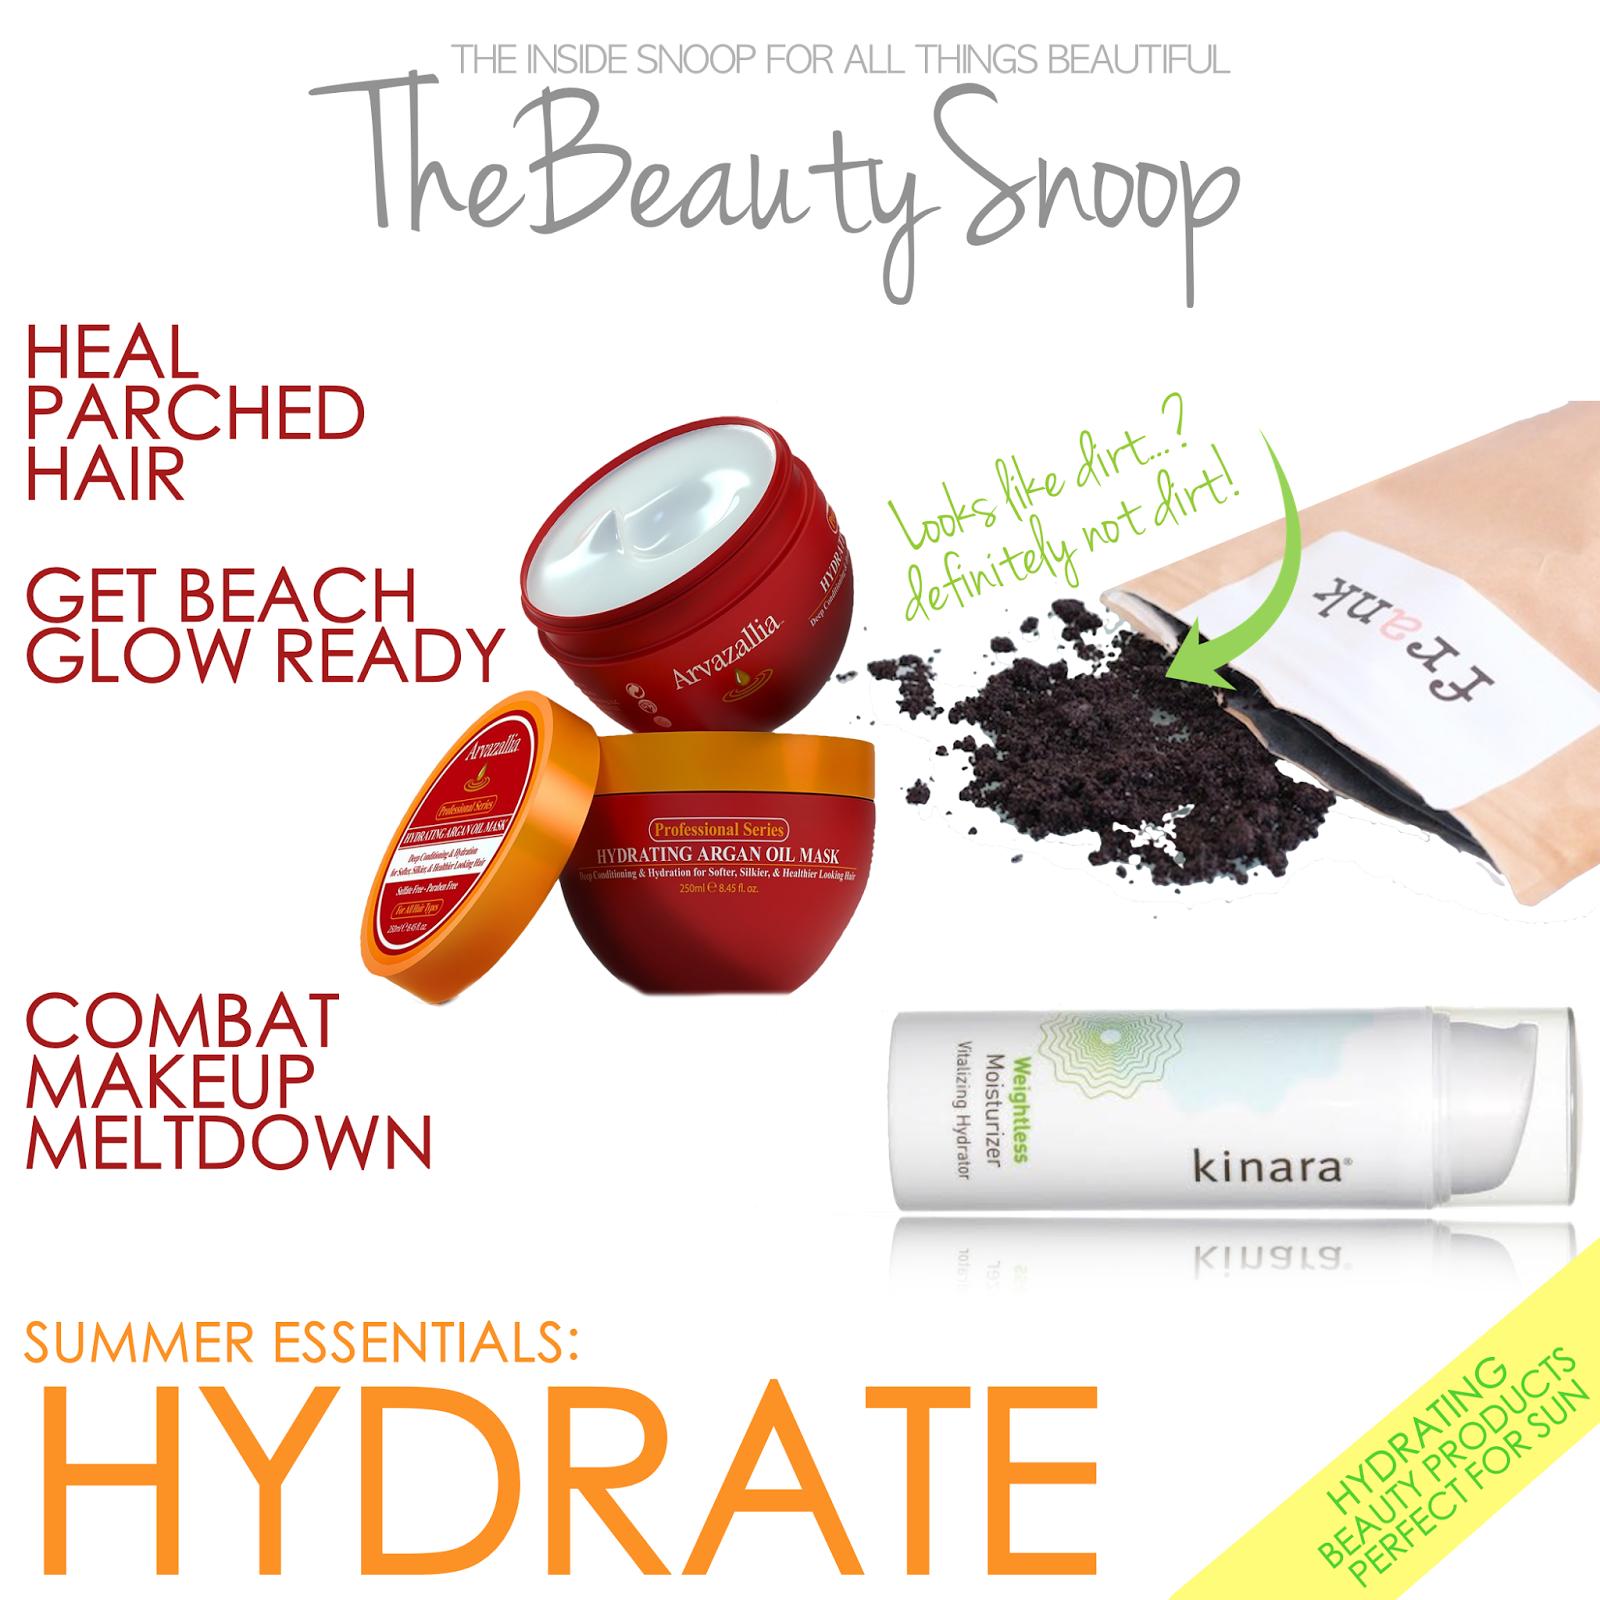 Kinara moisturizer, Frank body scrub, Arvazallia Argon Mask review